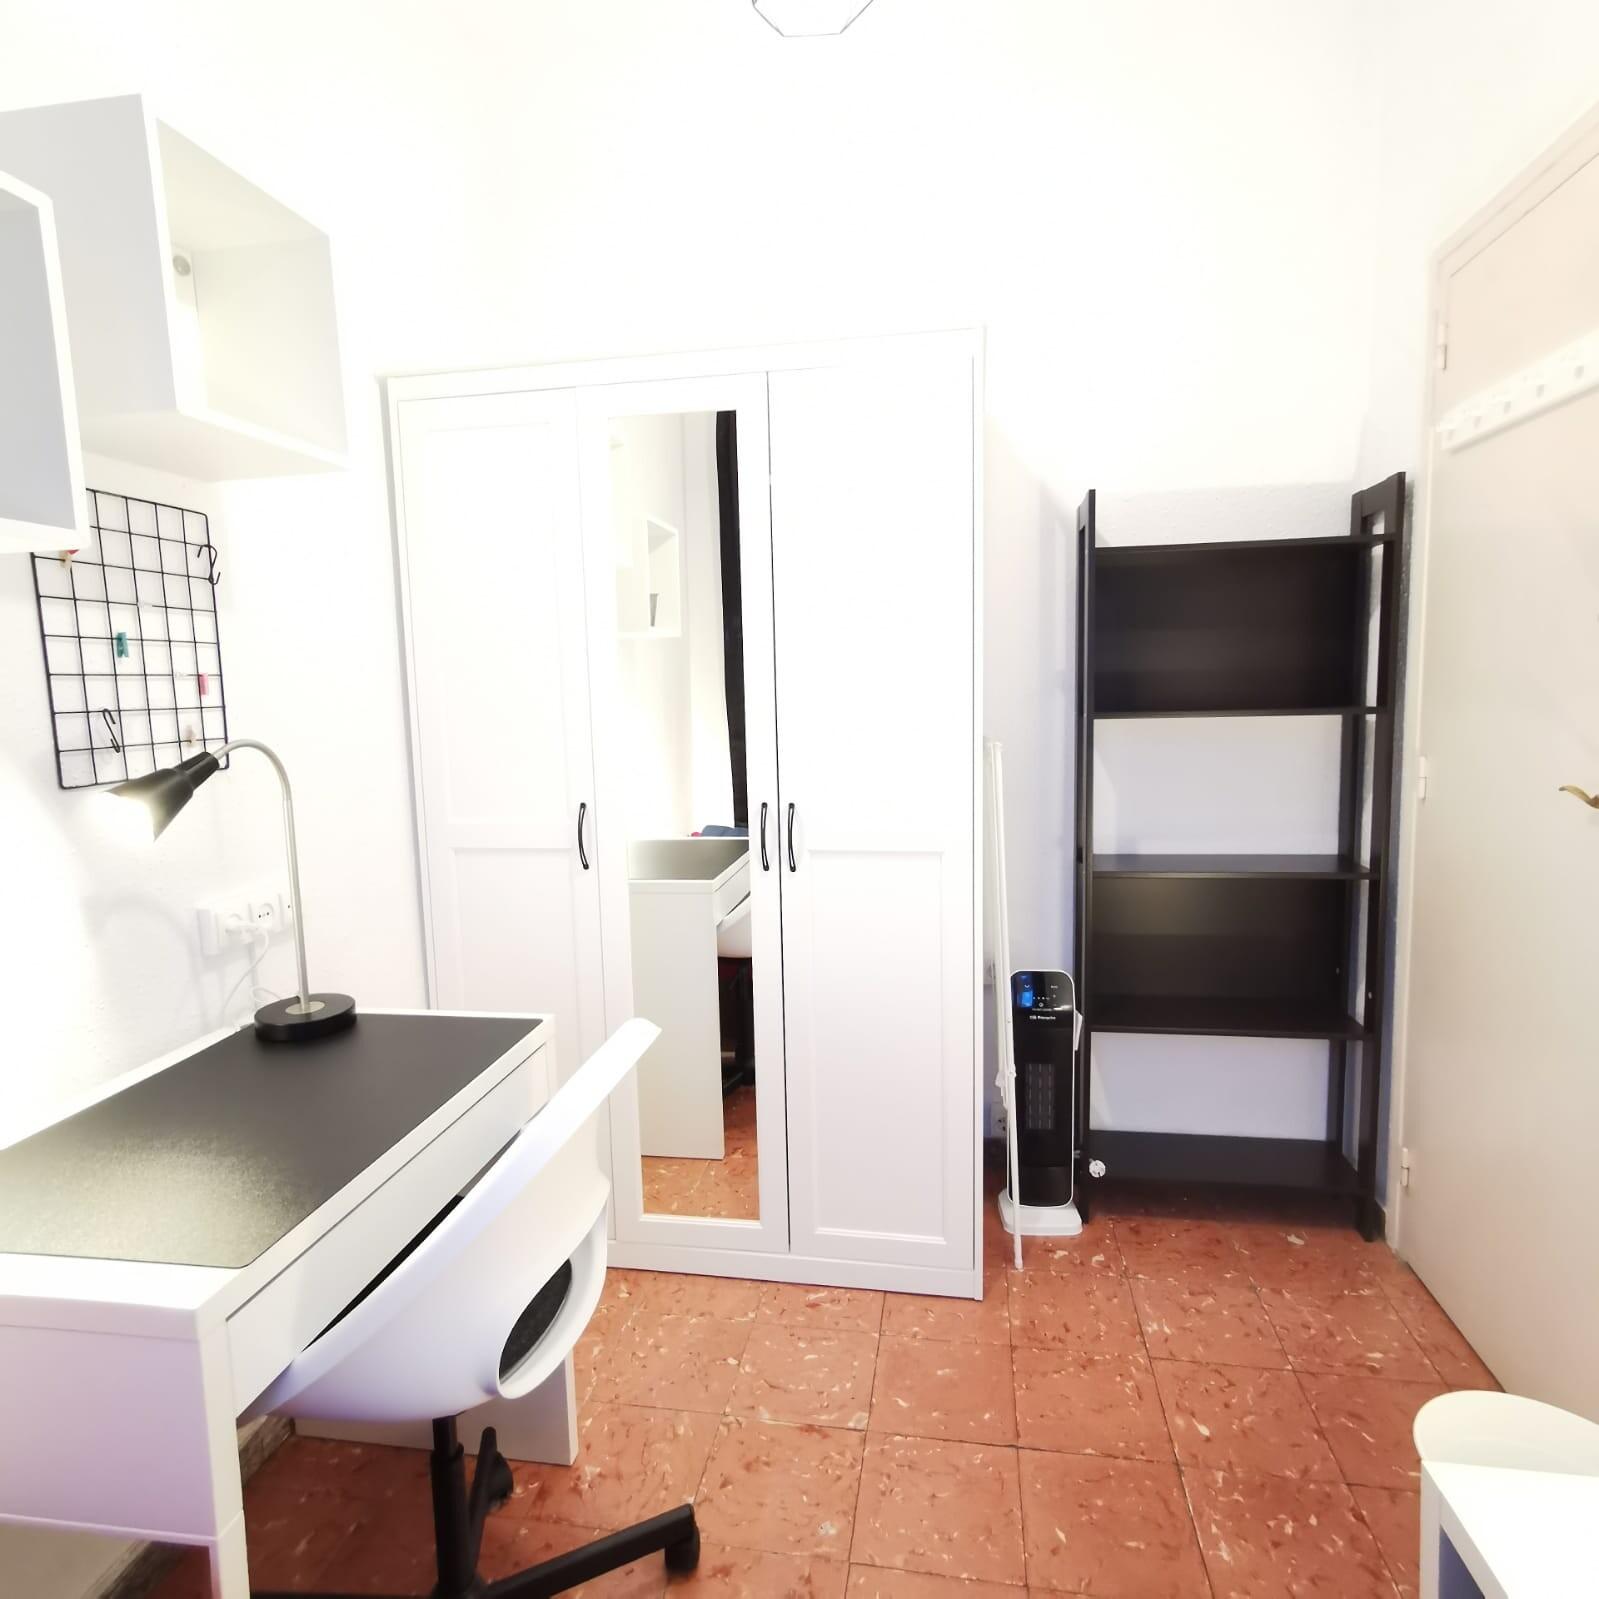 ROOM 4_Student single room in Sagrada Familia